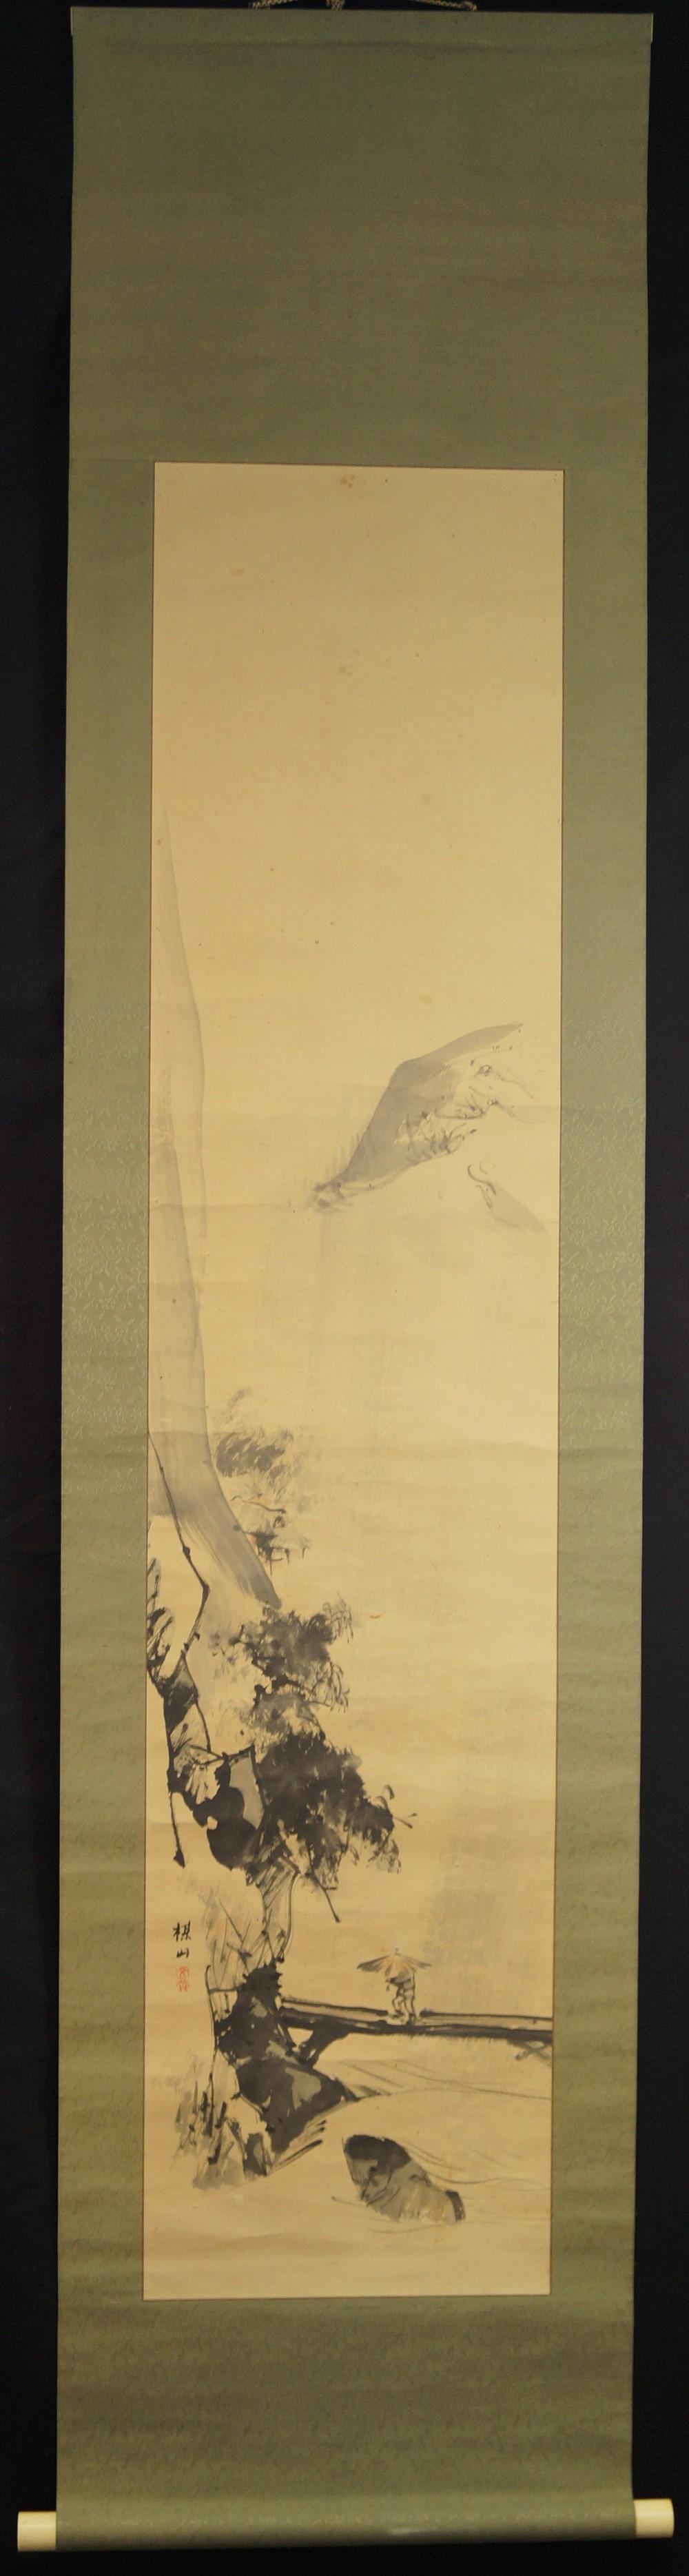 Verregnete Berglandschaft - Japanisches Rollbild (Kakejiku, Kakemono)